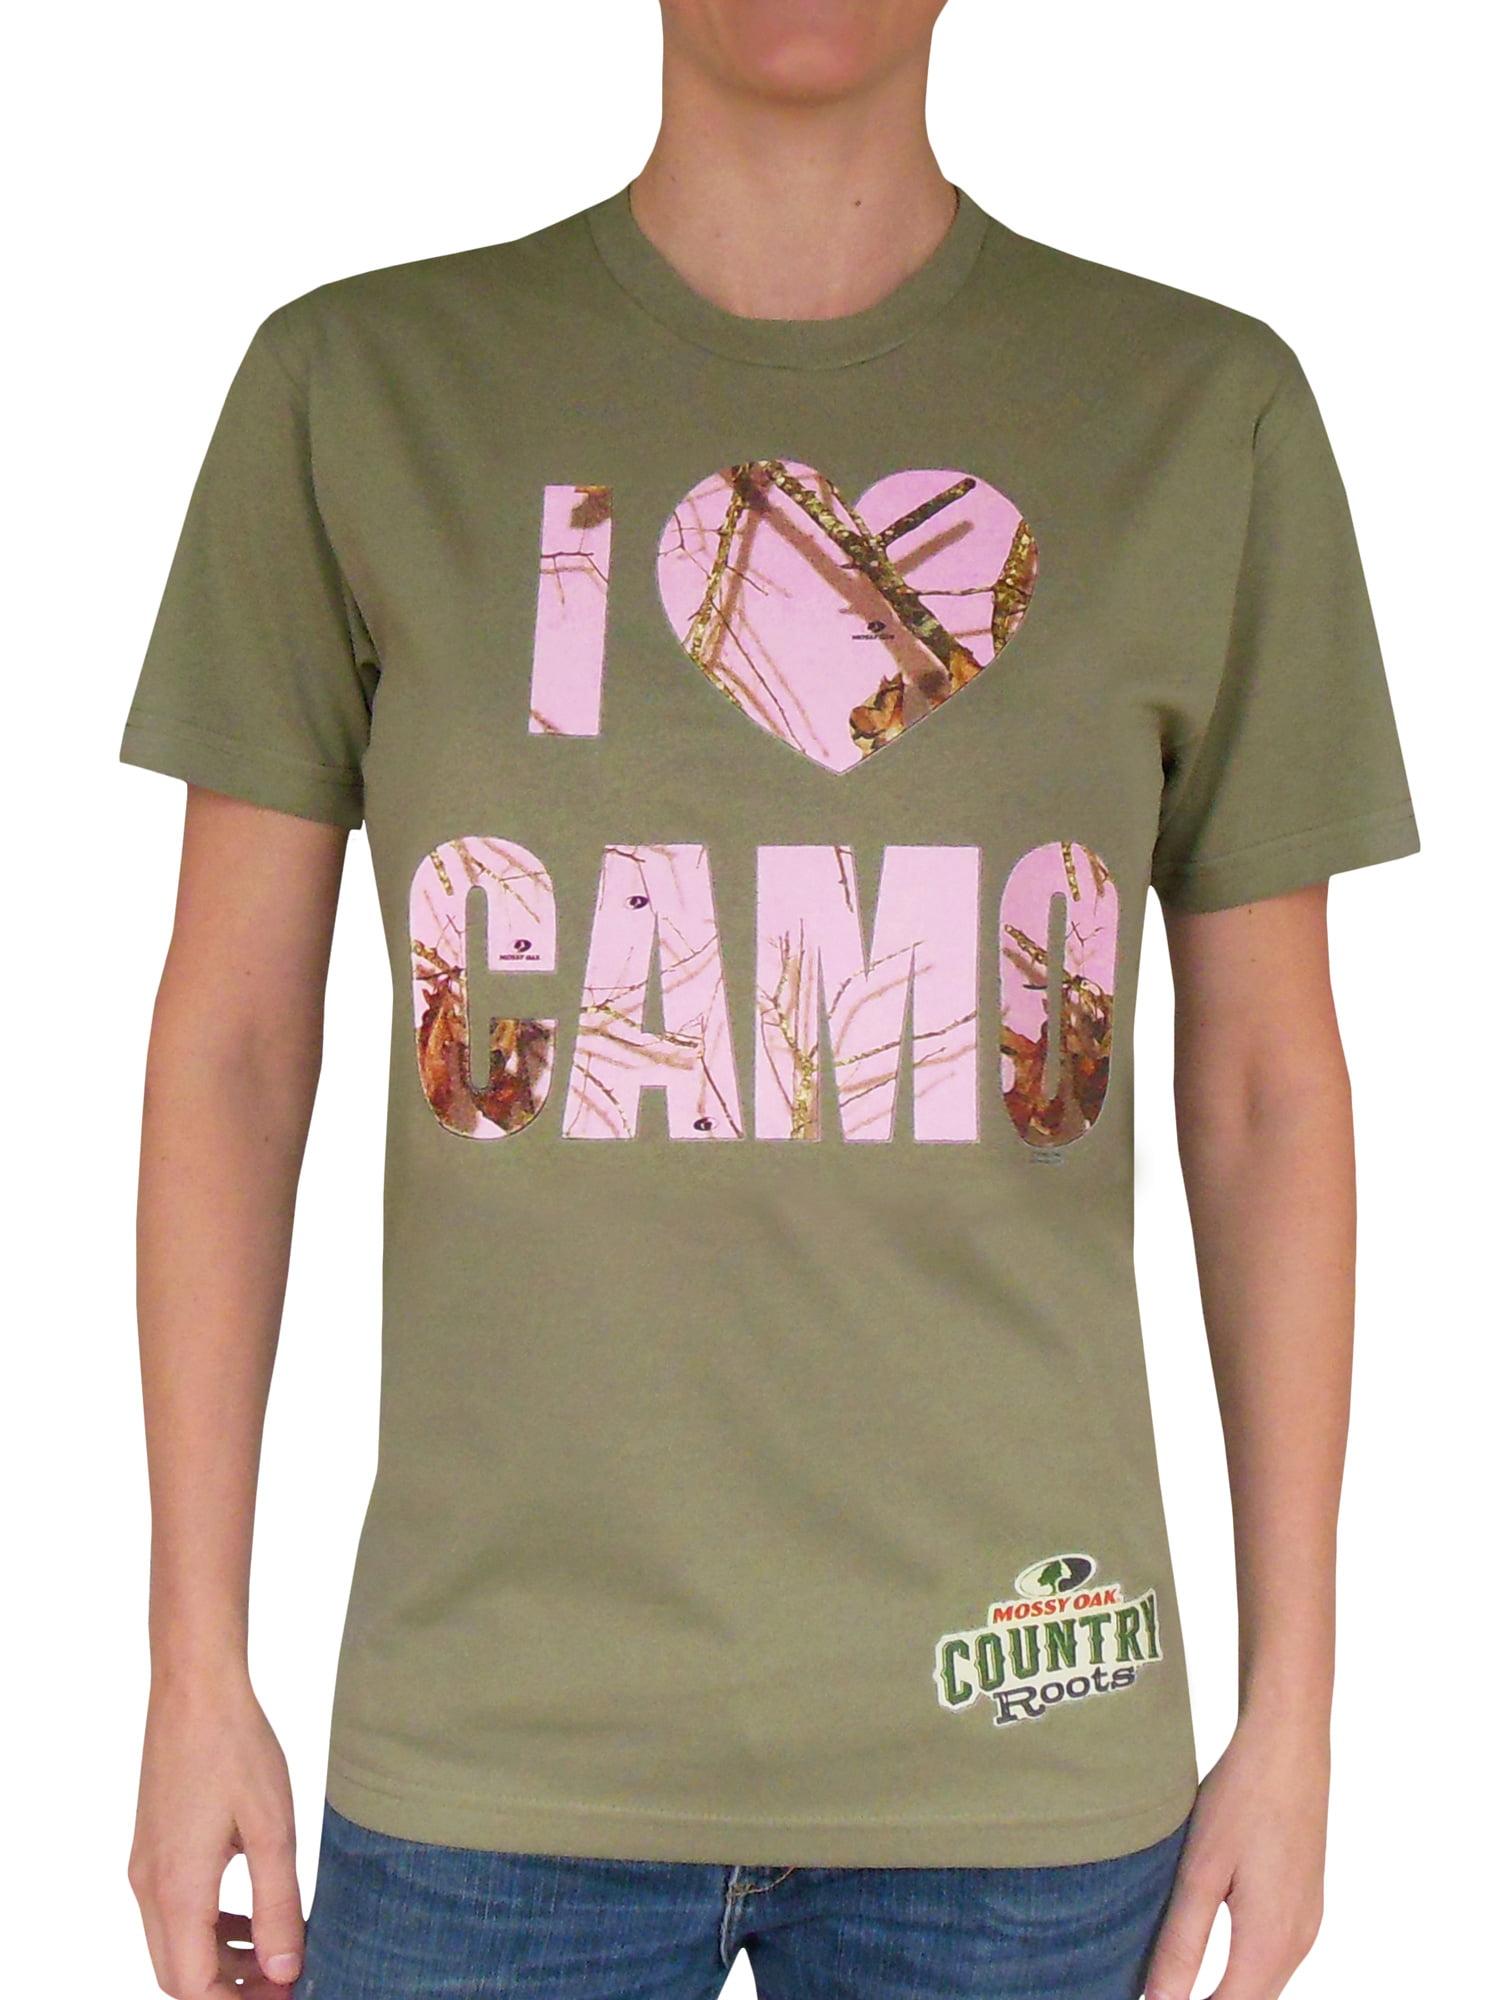 2b95d36b09a40 MOSSY OAK NWT Womens Tee T Shirt L Black Pink Camouflage Top .